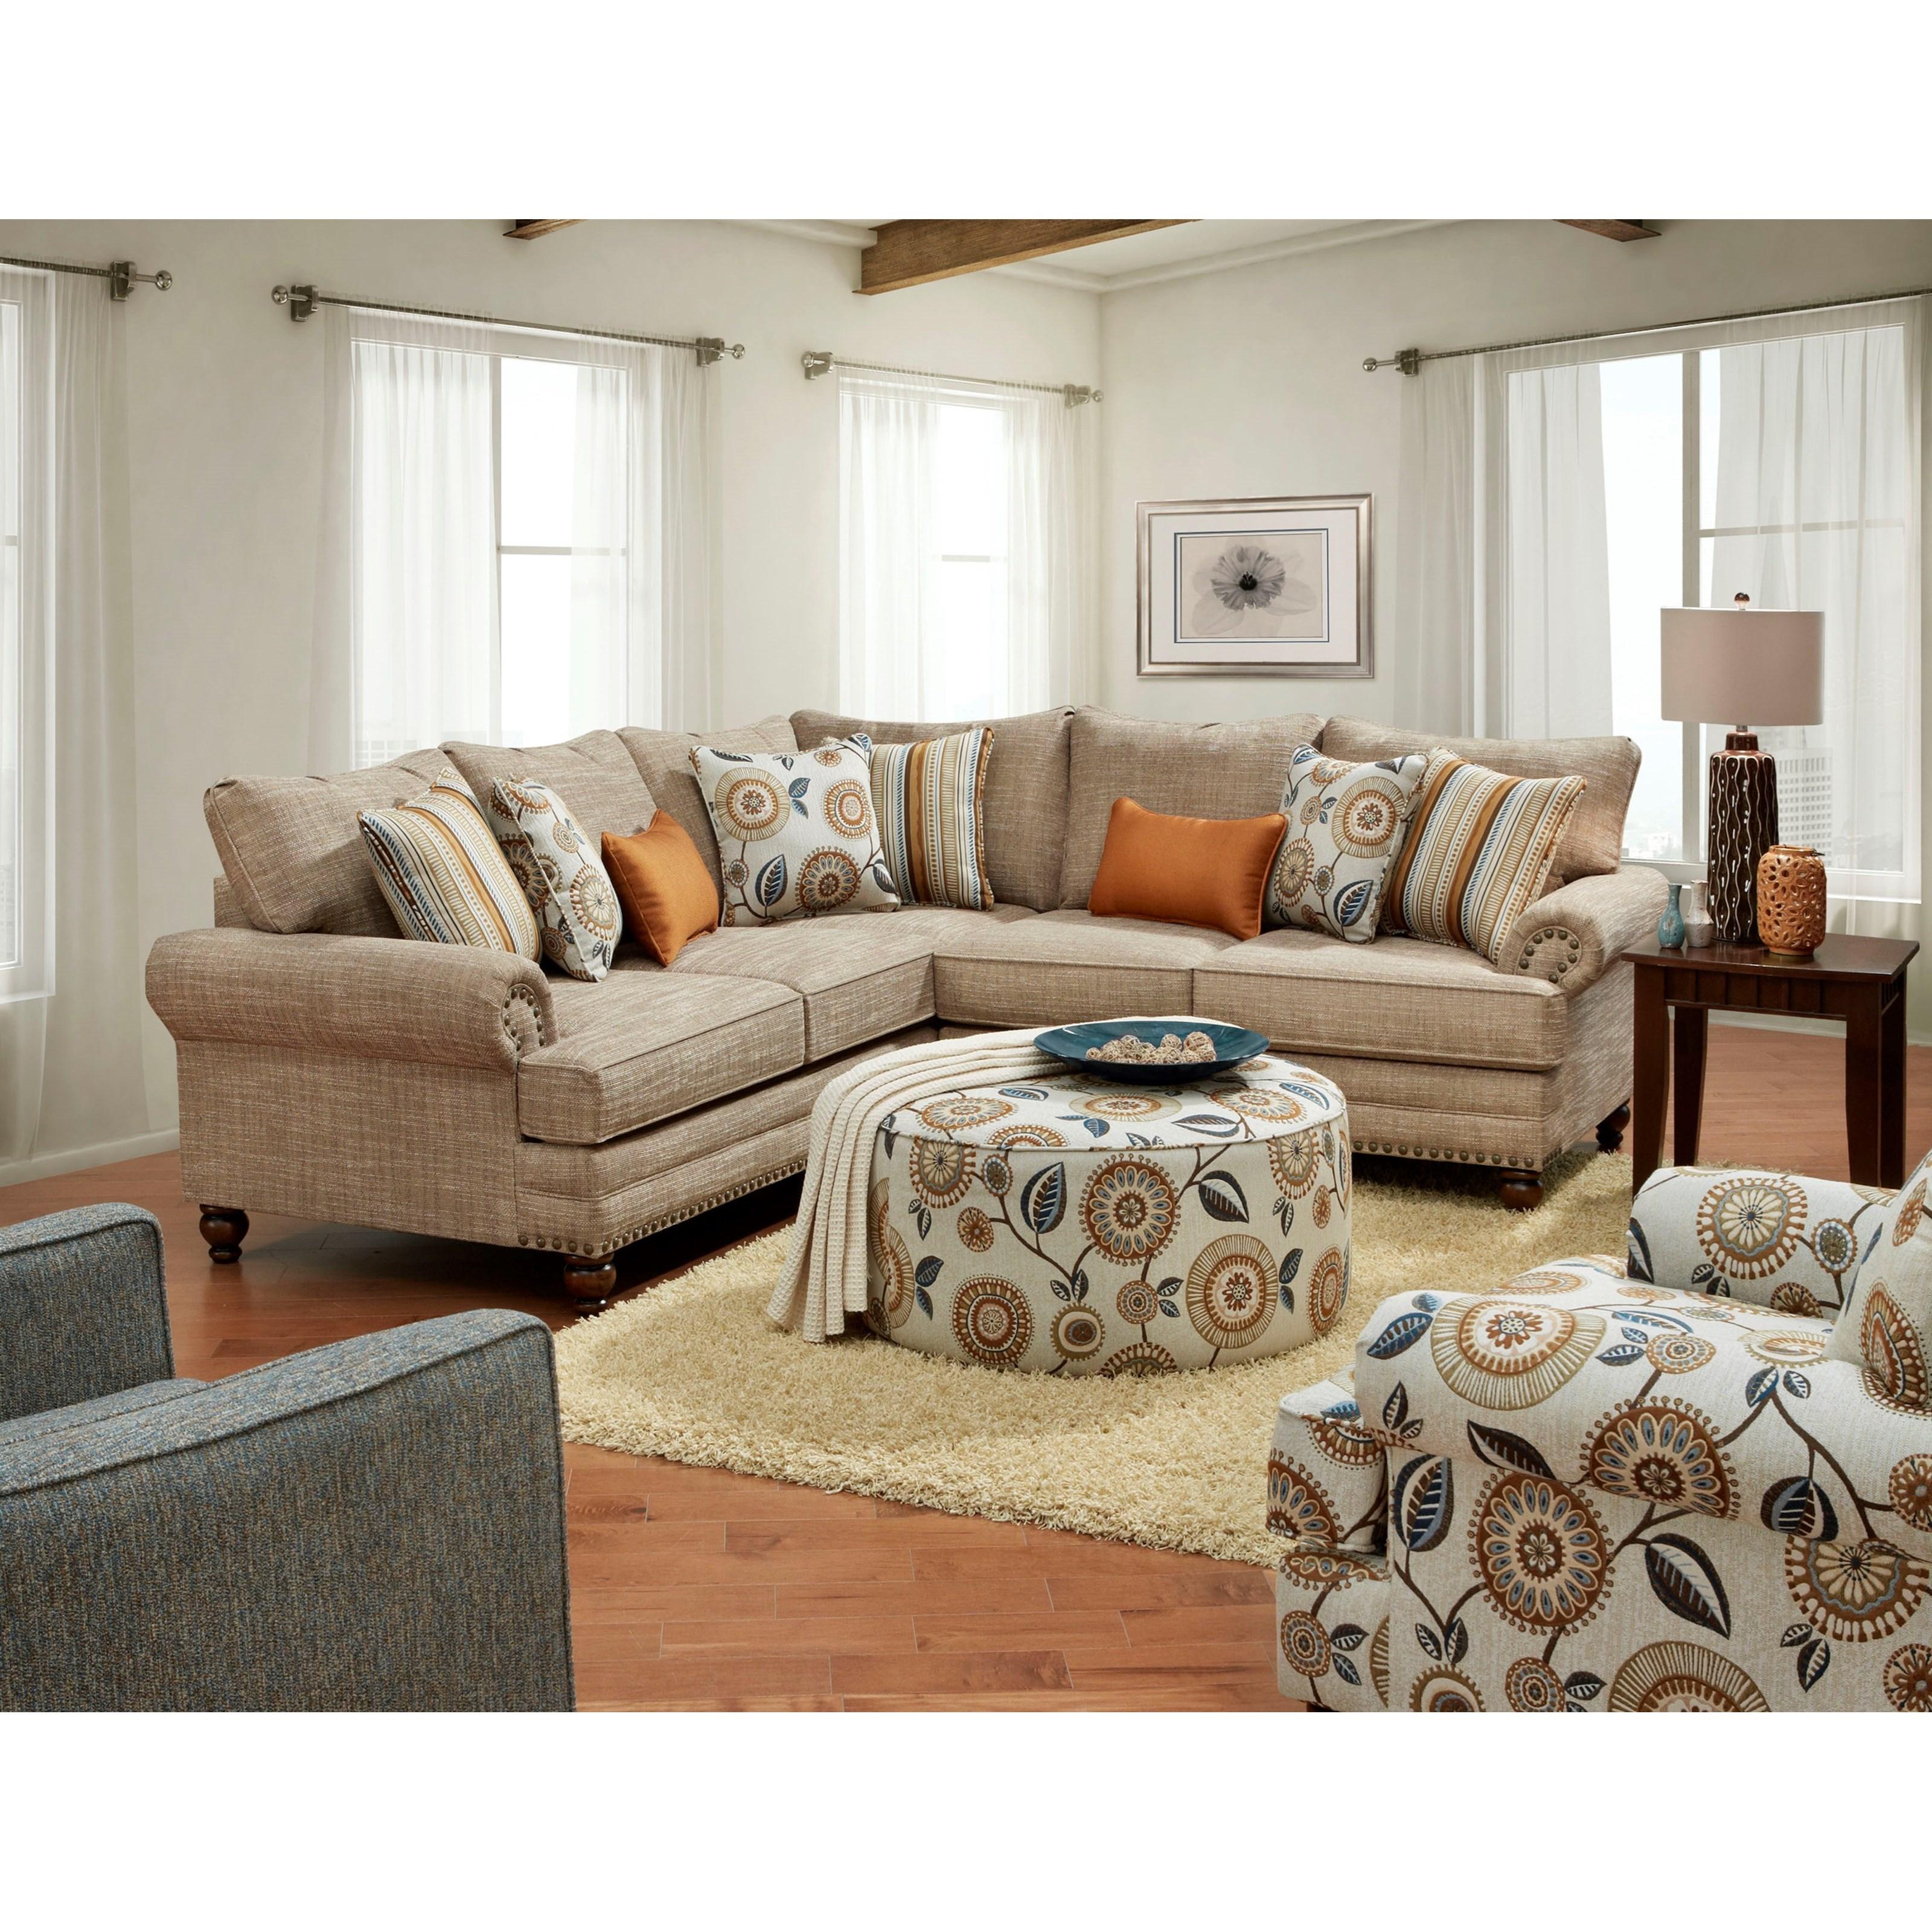 Haley Jordan Nori Stationary Living Room Group - Item Number: 2826-2827 Living Room Group 1